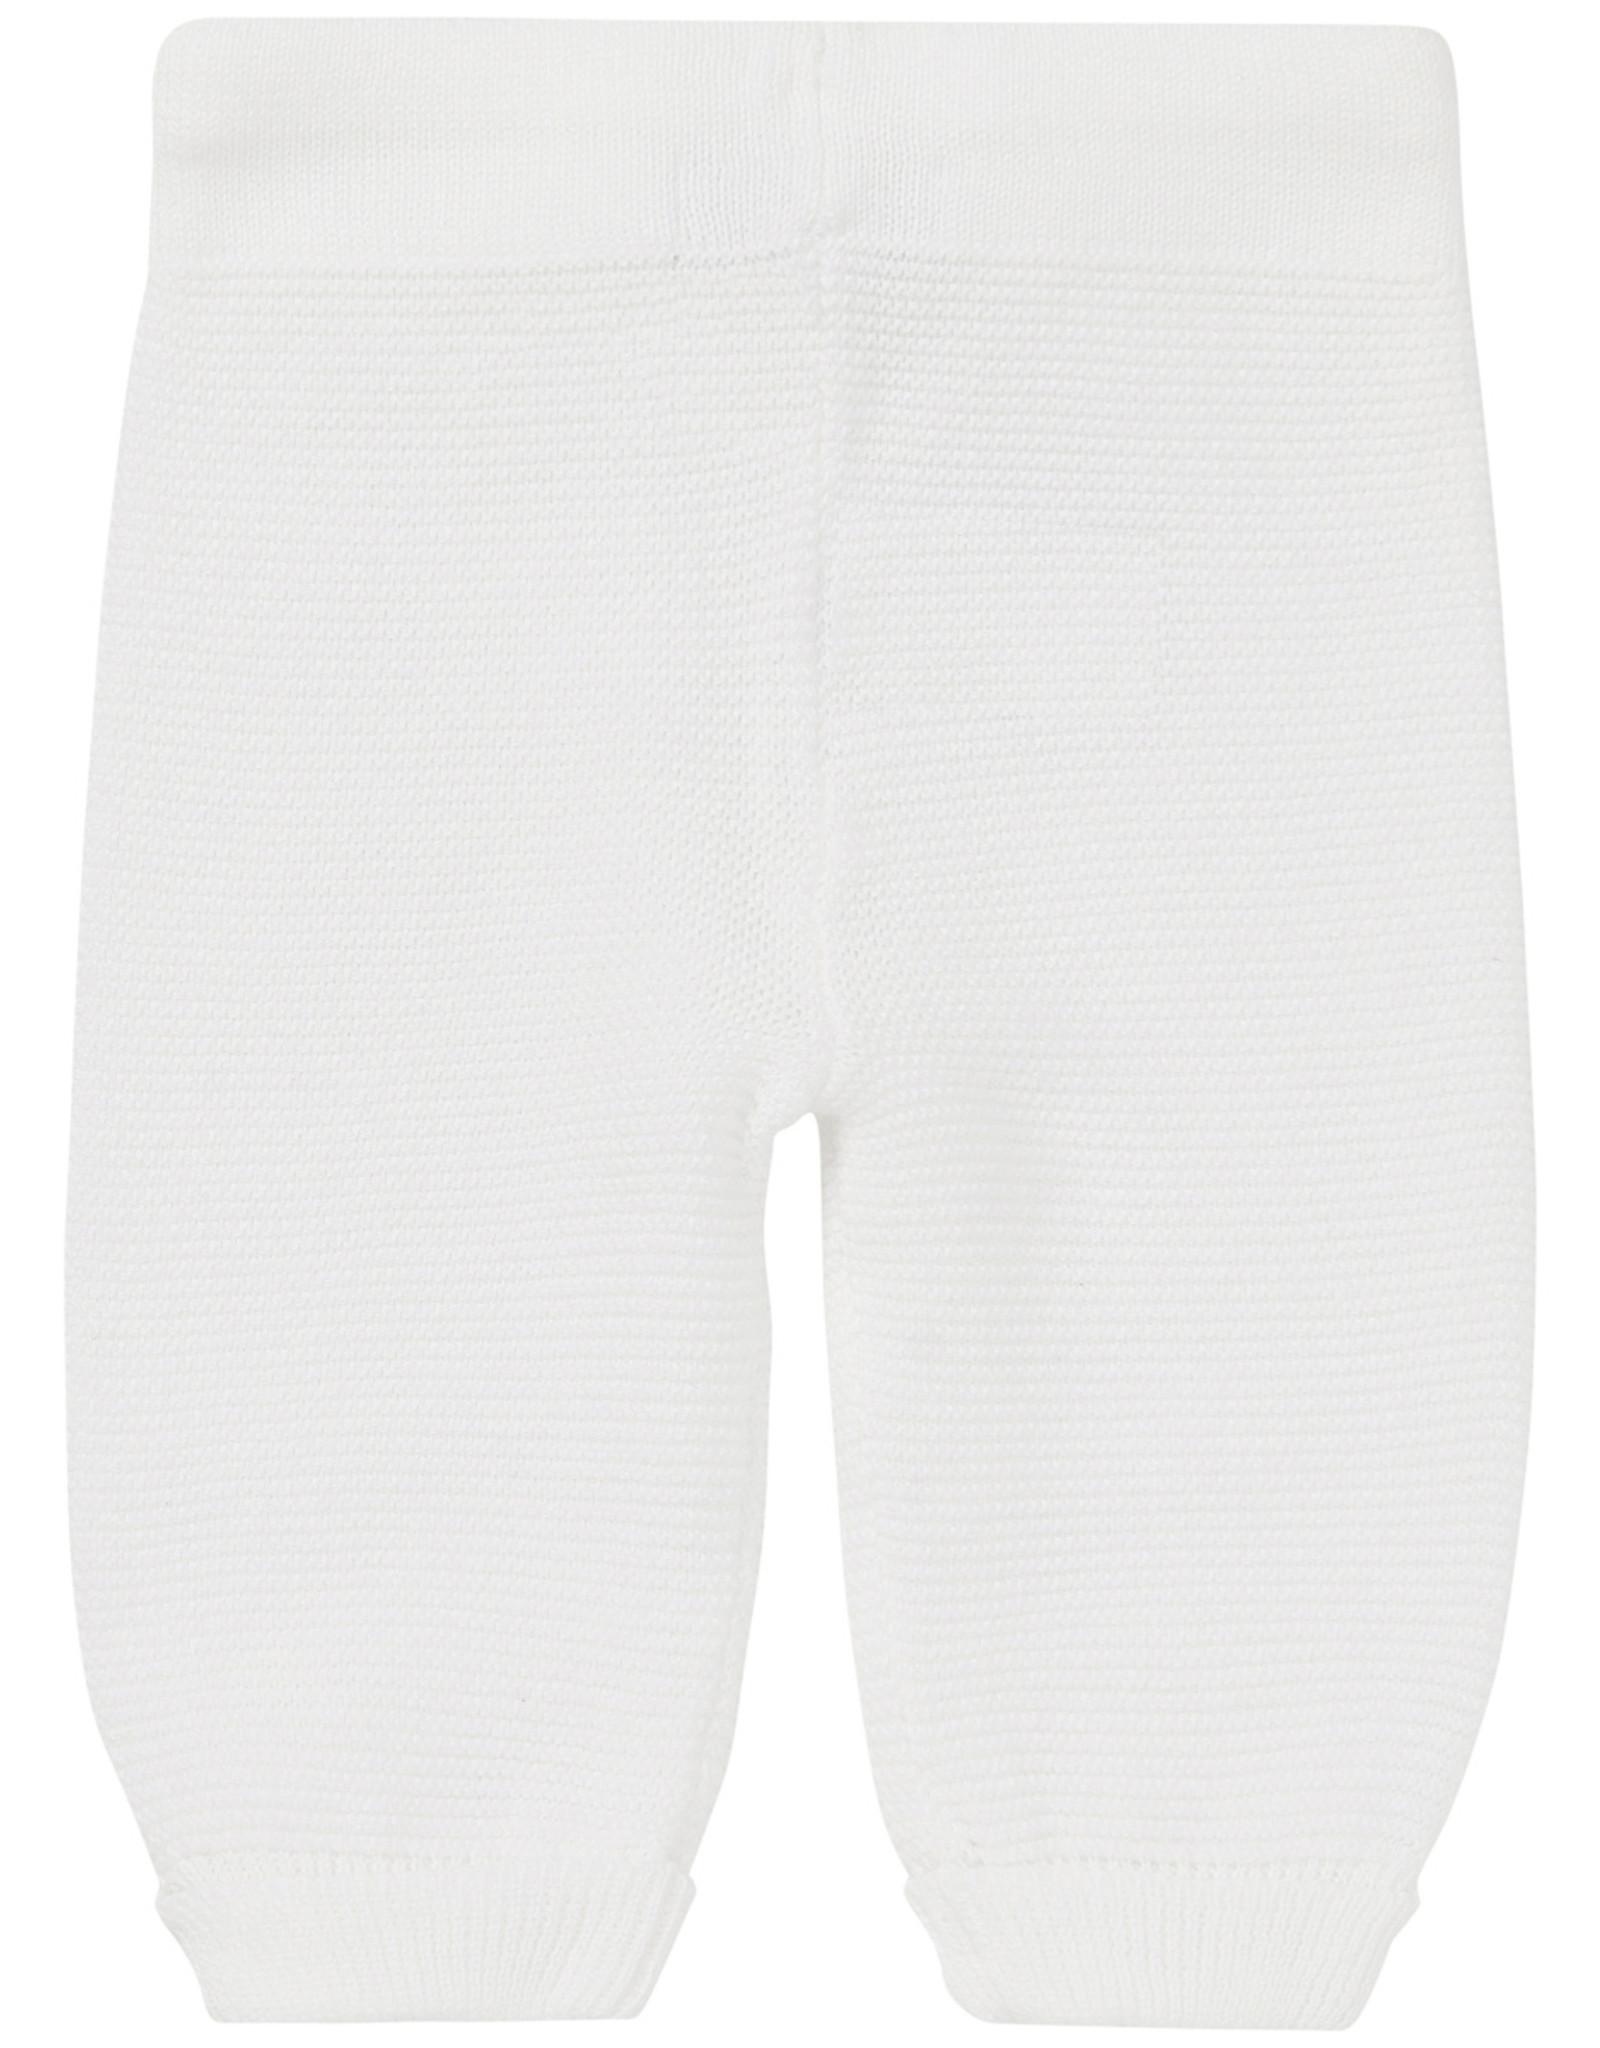 Noppies U Pants Knit Reg Grover white